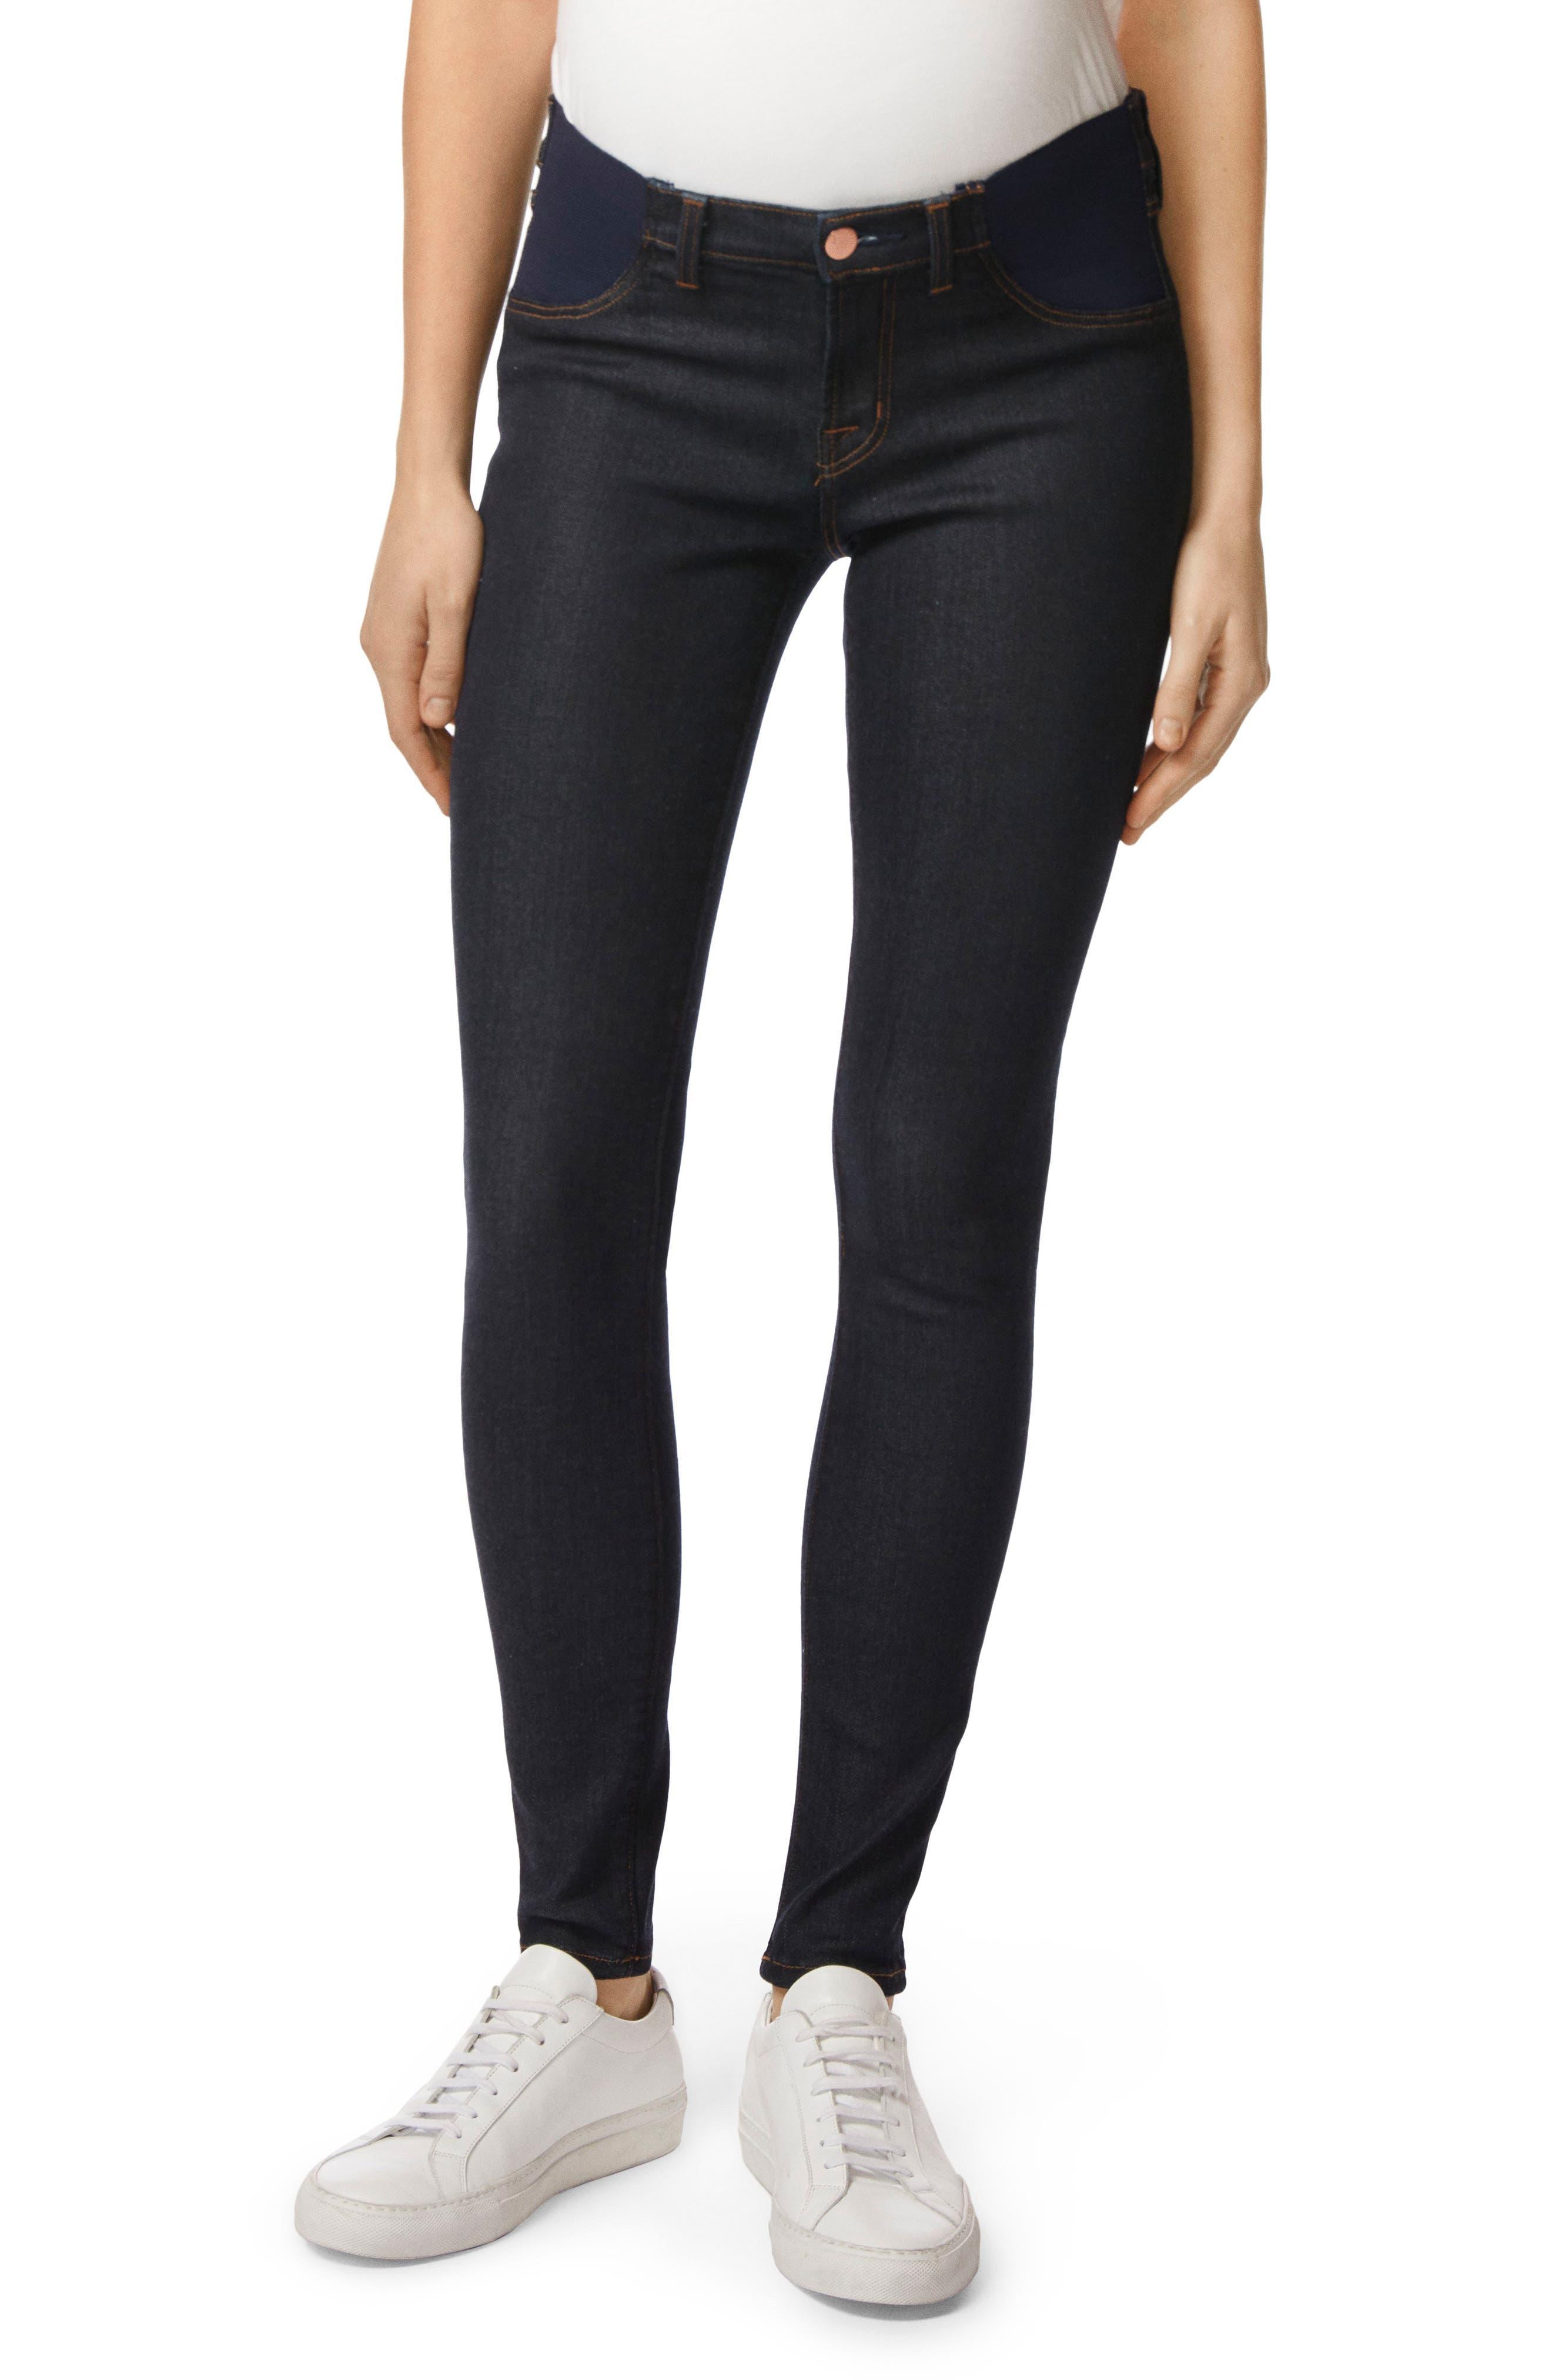 Mama J Super Skinny Maternity Jeans,                         Main,                         color, 417